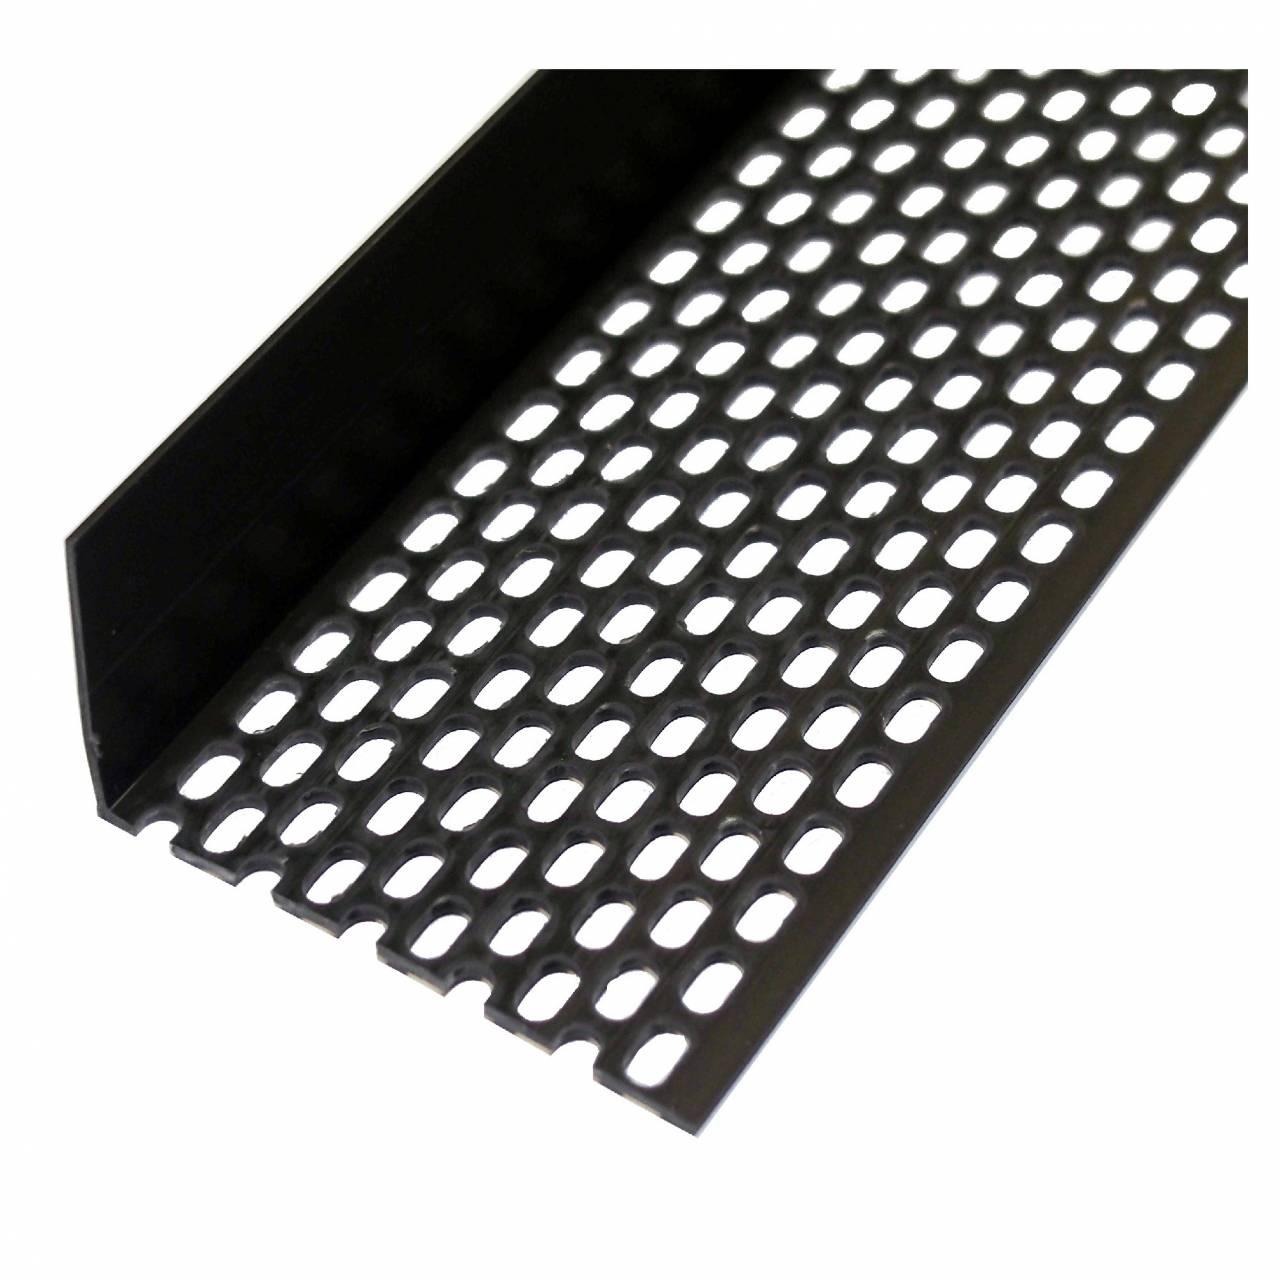 Lüftungsprofil 30 x 90 schwarz / Bd a 10 x 2,5 m Stäbe